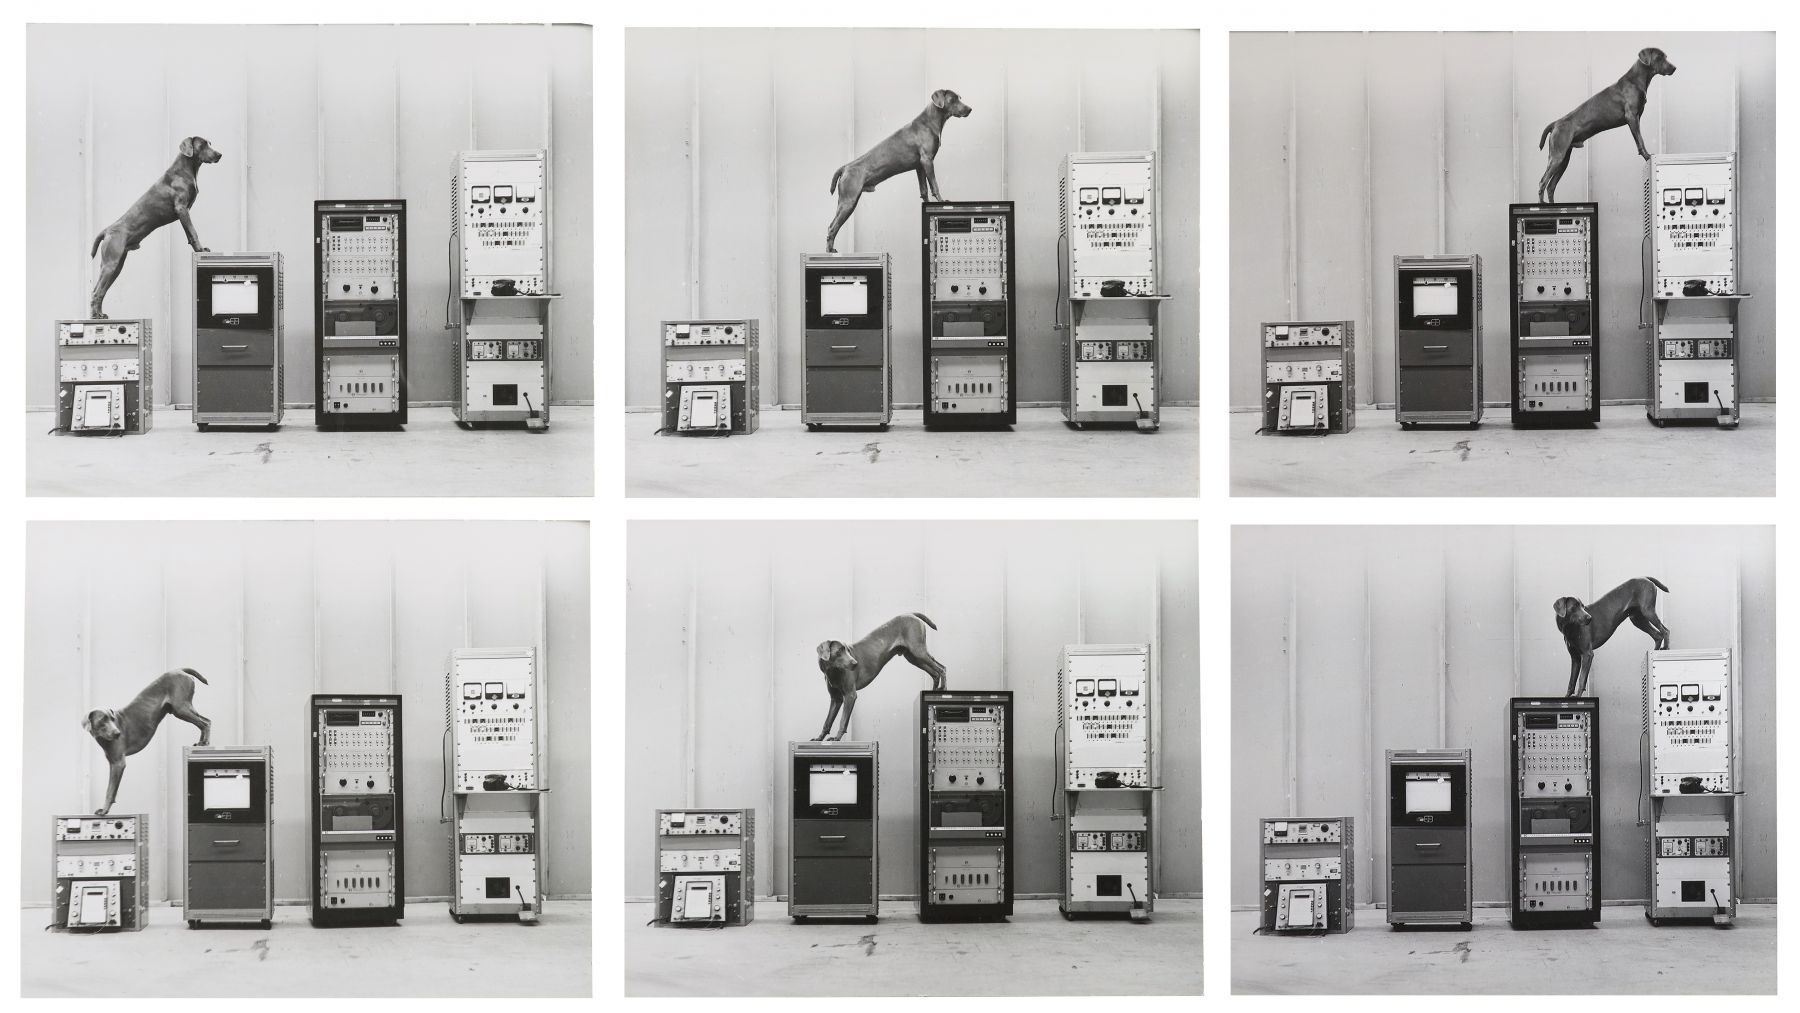 William Wegman,Ray-O-Vac, 1973.